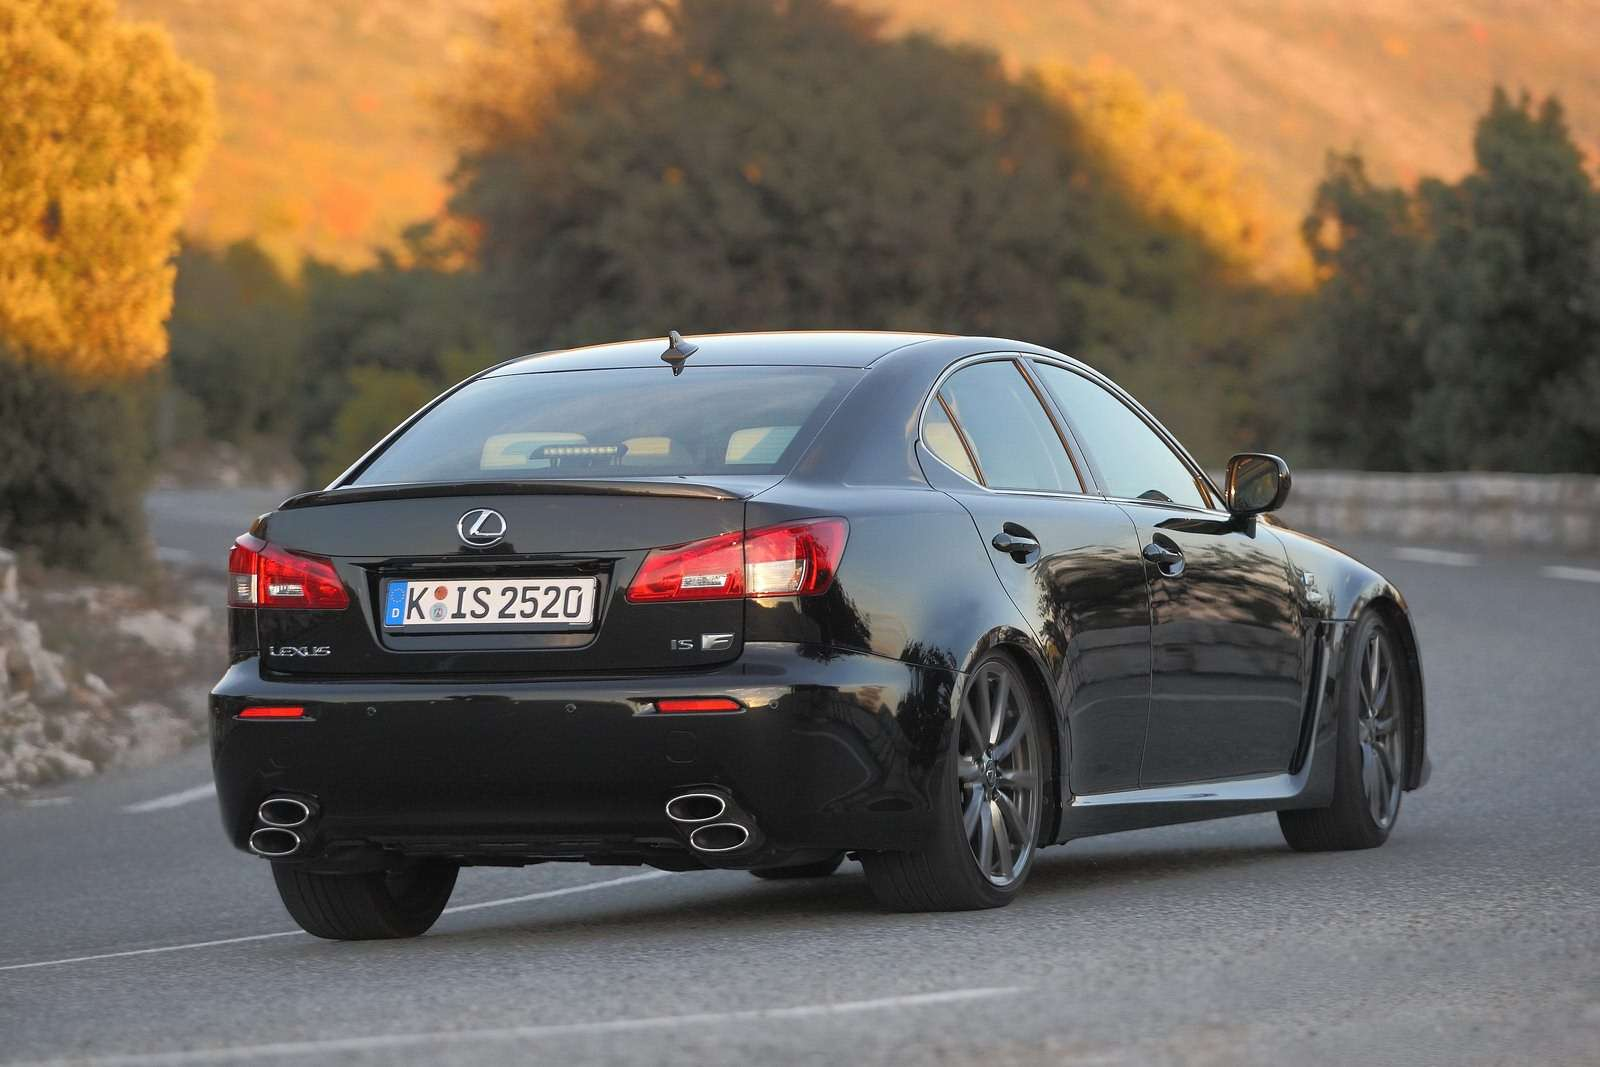 Lexus ISF 2011MY sierpien 2011